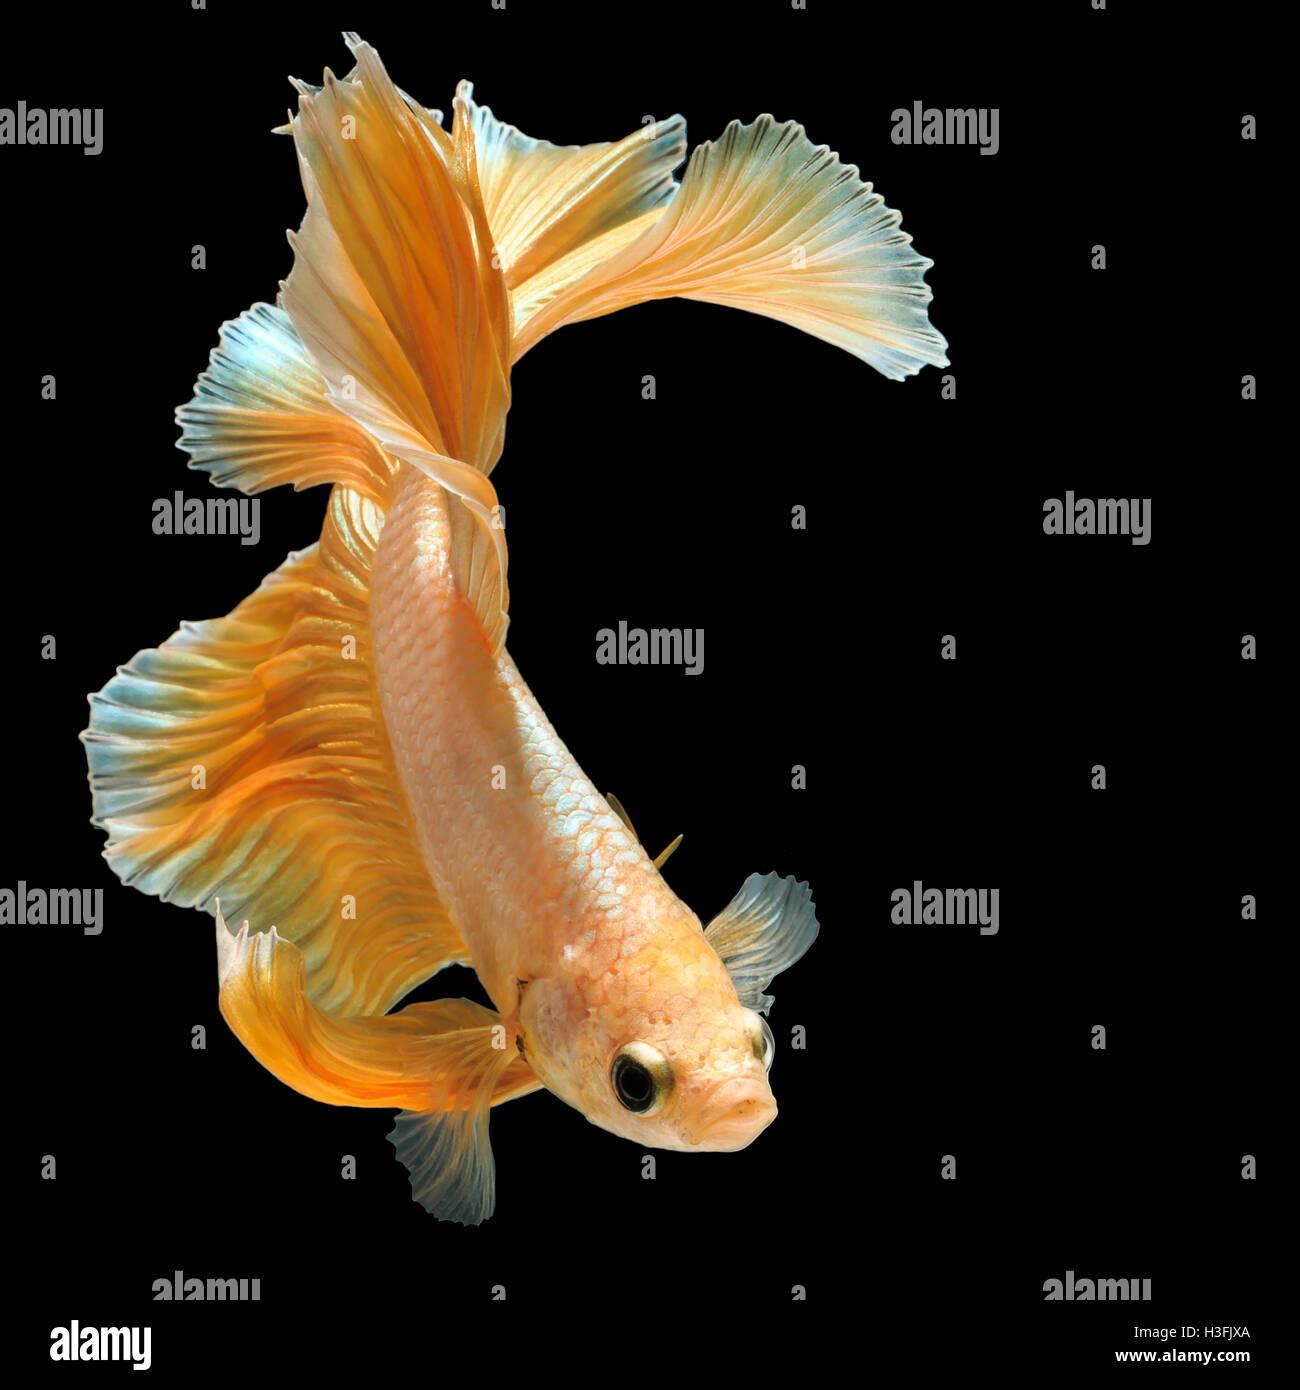 Betta fish, siamese fighting fish 'gold half moon' isolated on black background beautiful movement macro - Stock Image